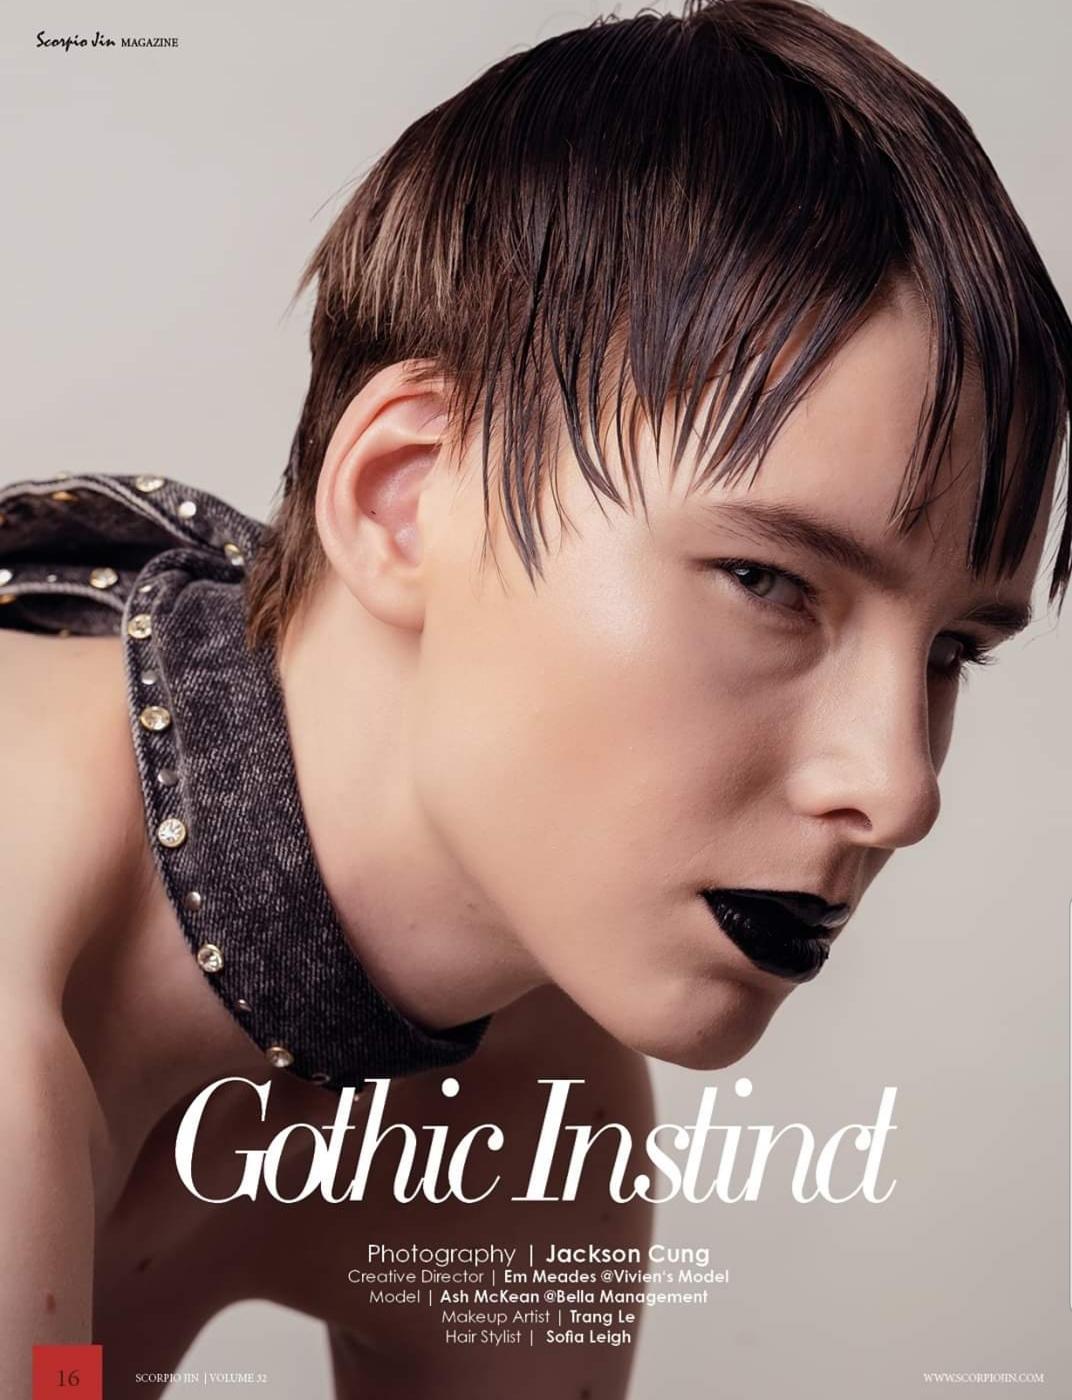 GOTHIC INSTINCT | SCORPIO JIN MAGAZINE VOL 32